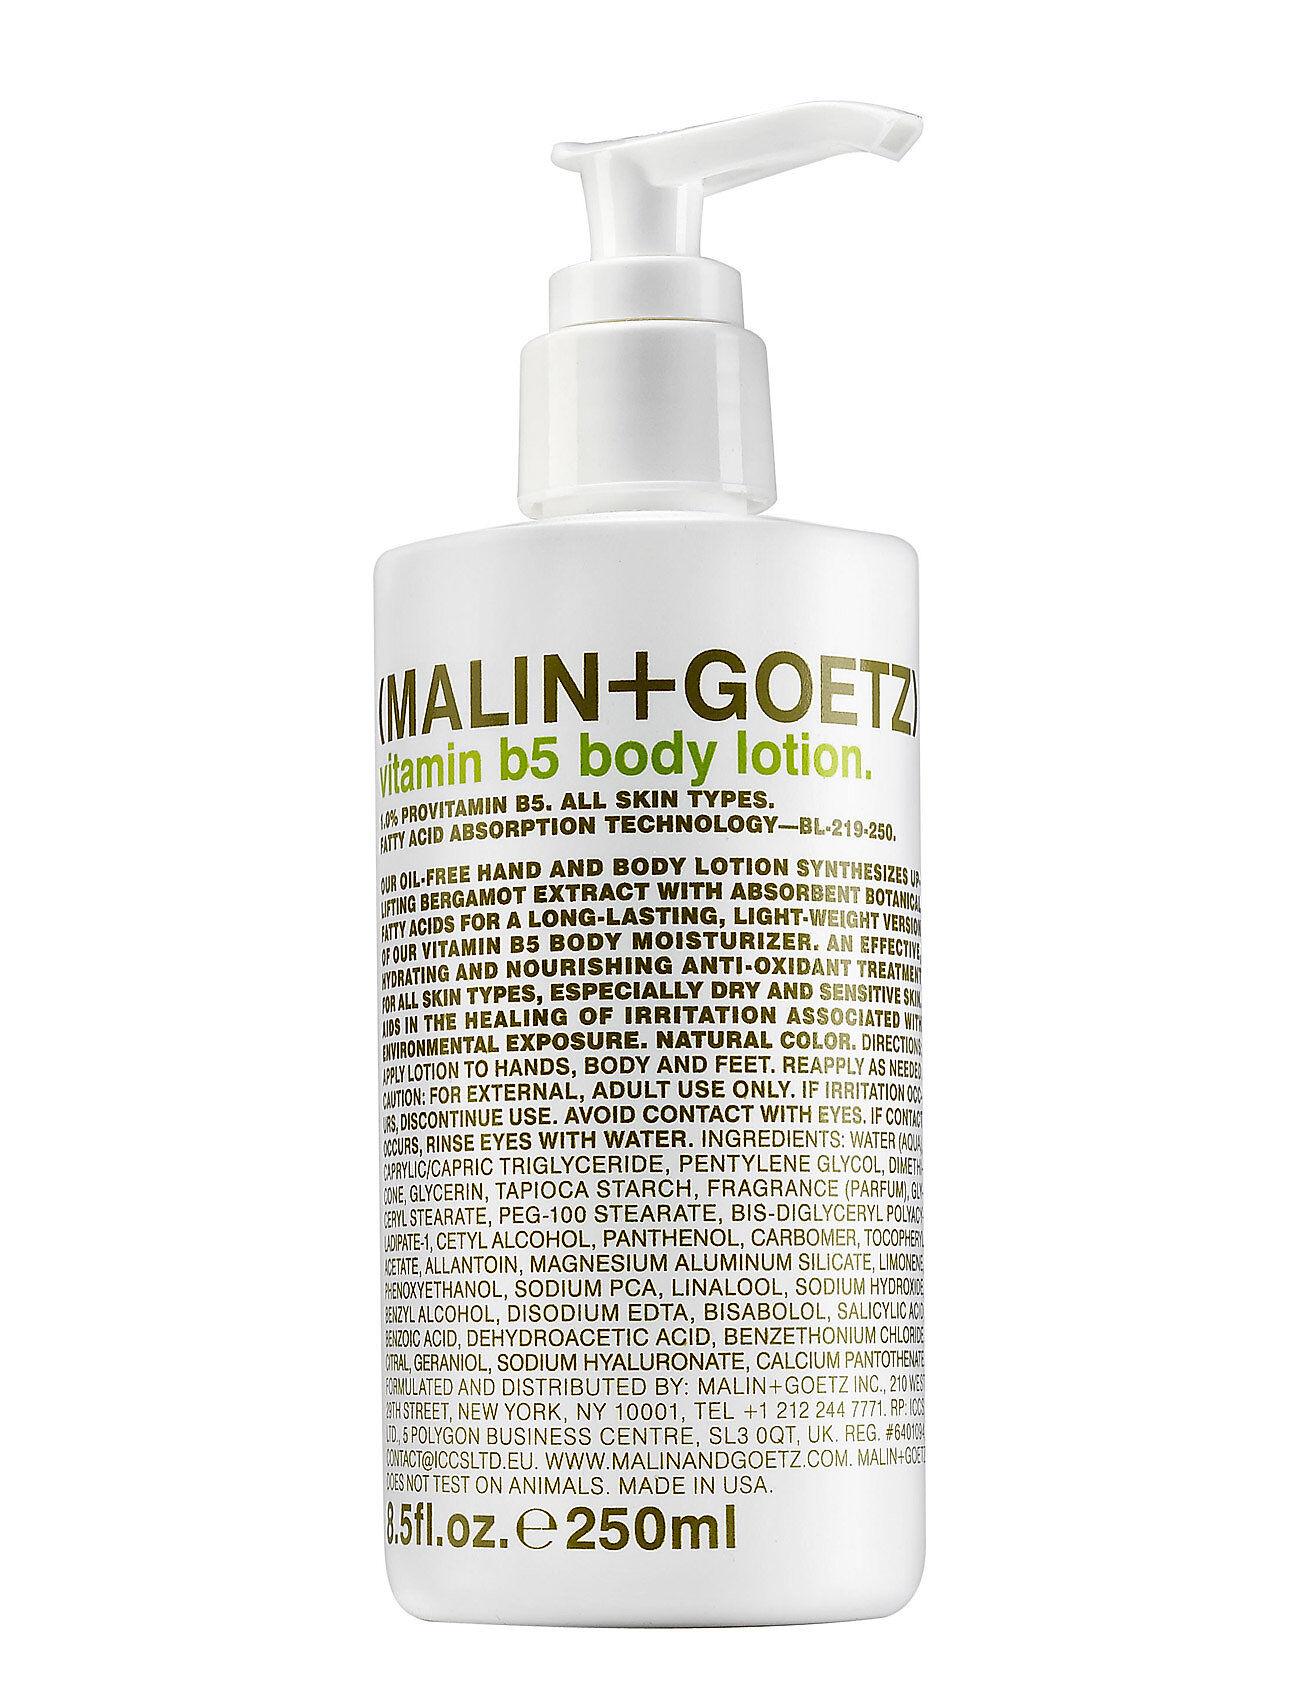 MALIN+GOETZ Vitamin B5 Body Lotion Kosteusvoide Vartalo Nude MALIN+GOETZ